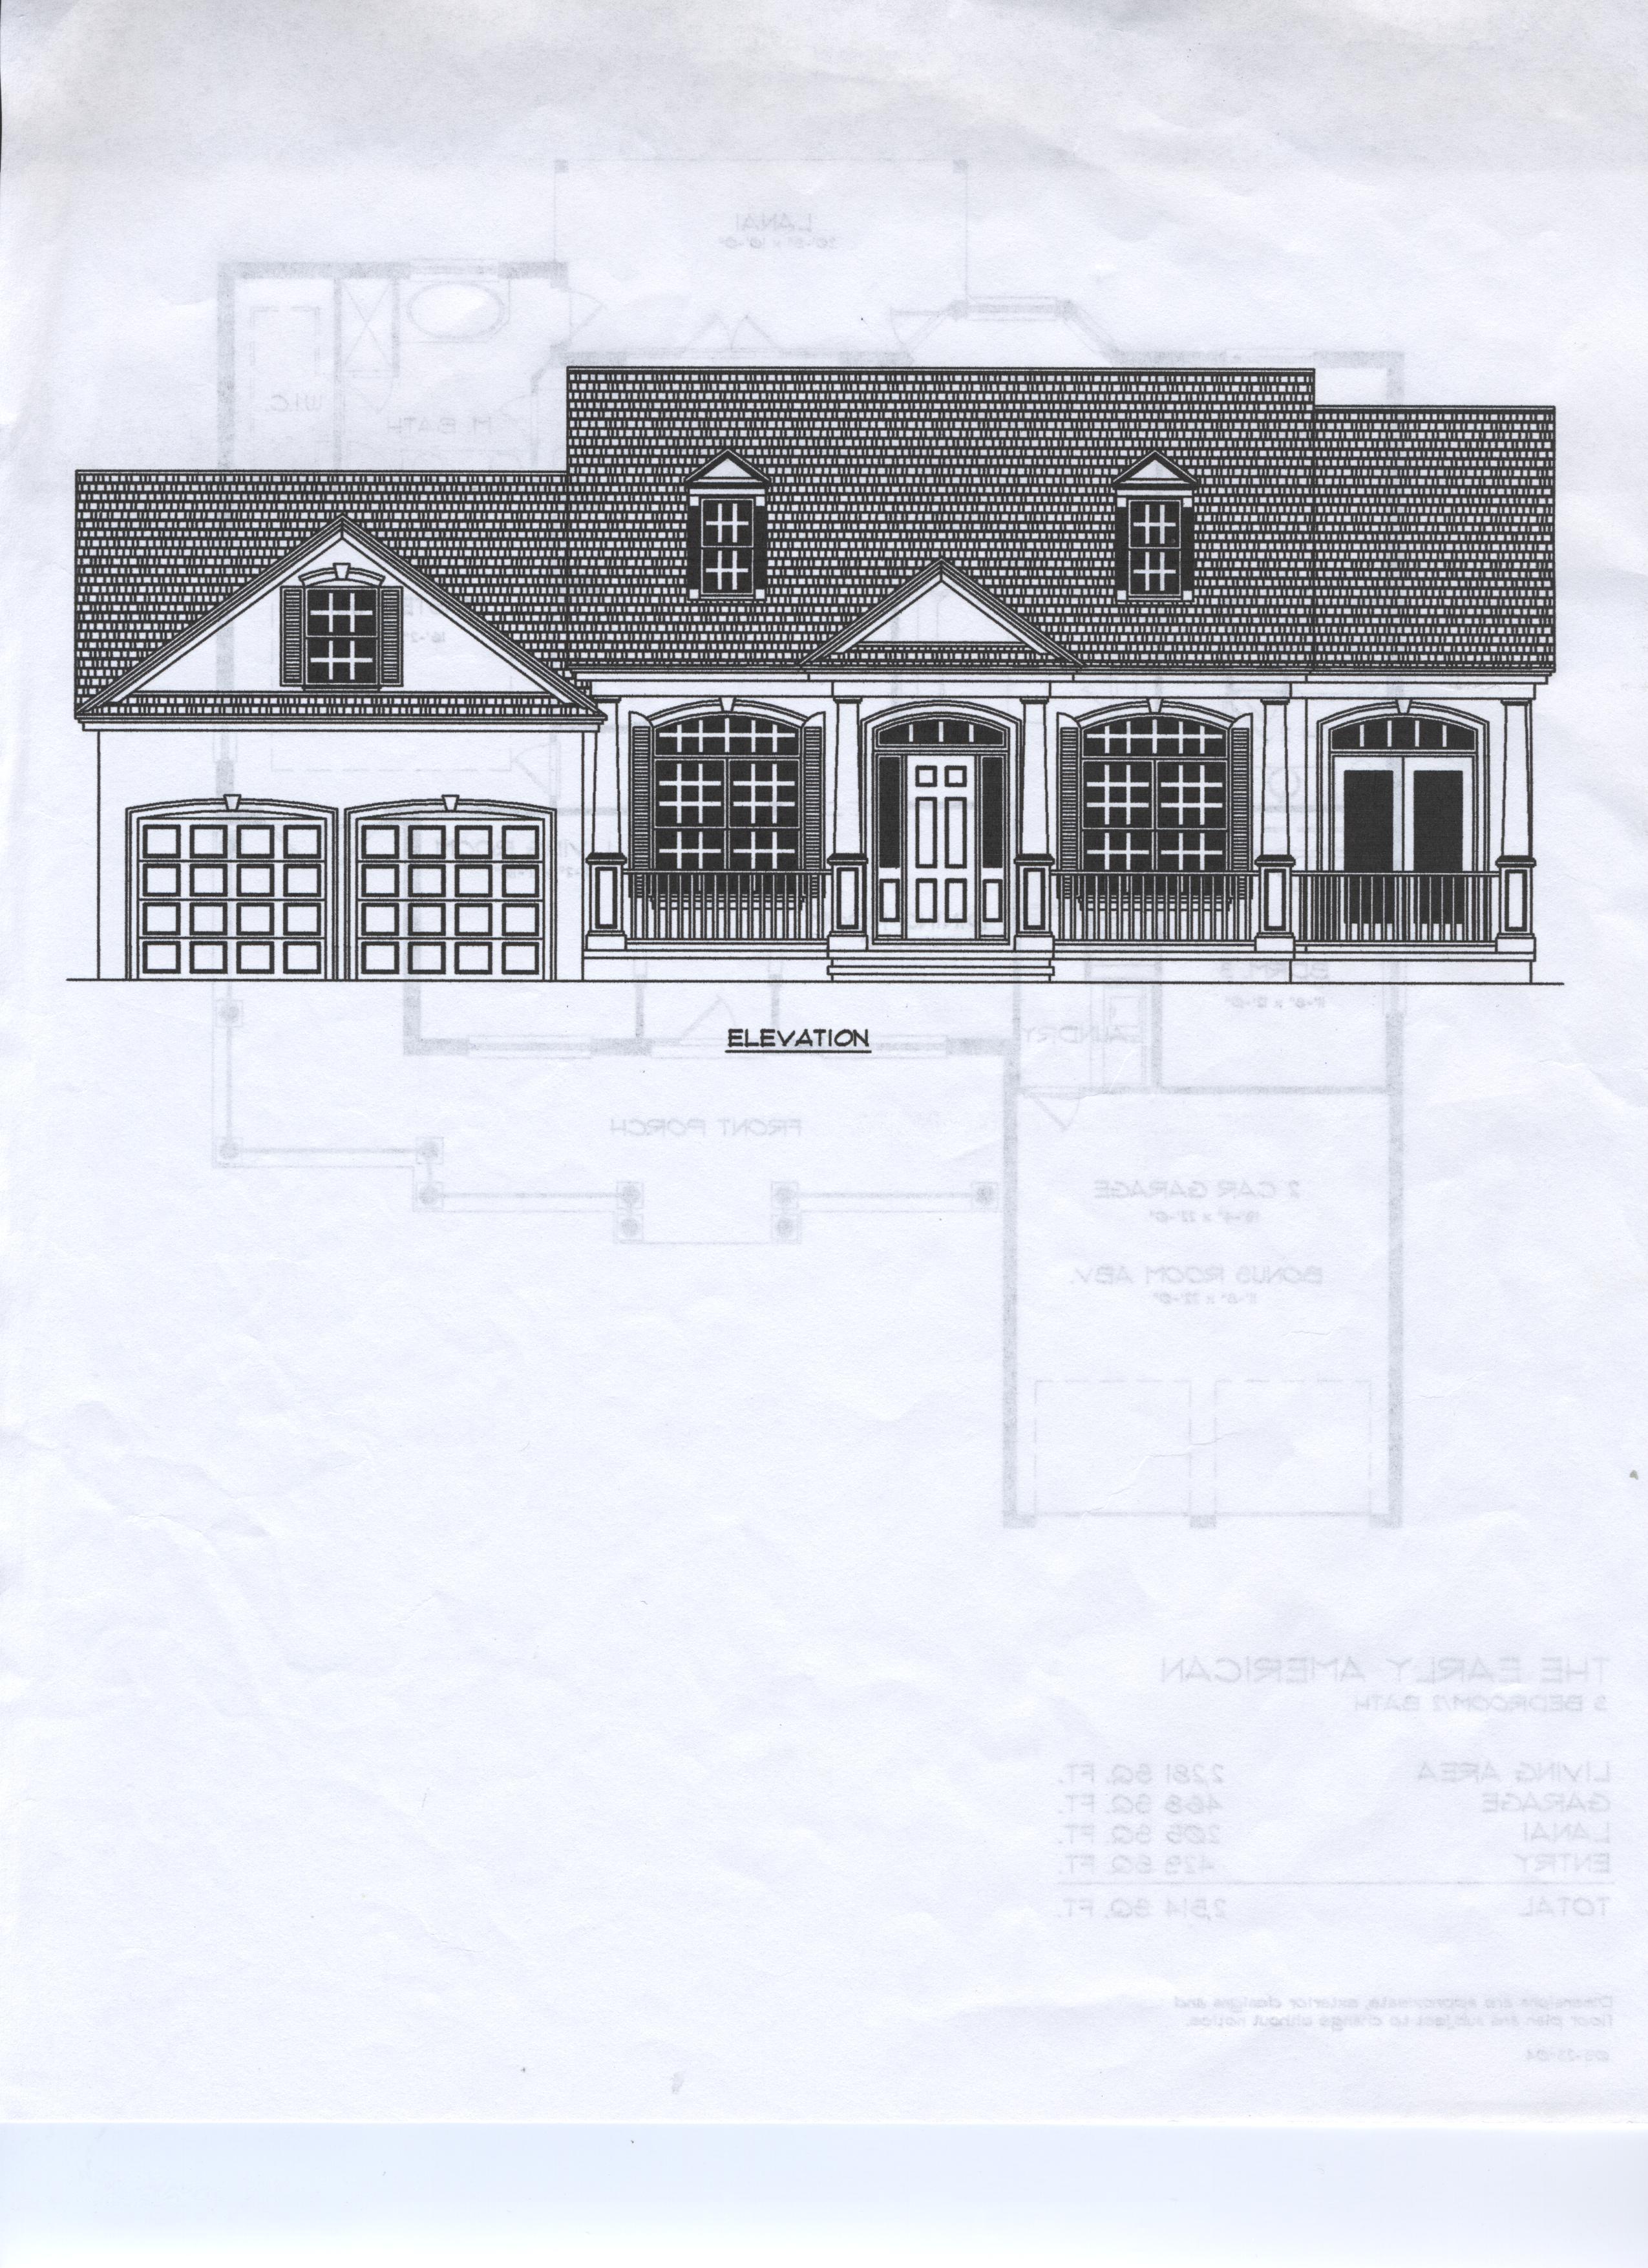 Single family plans r nunez homes inc for American family homes inc